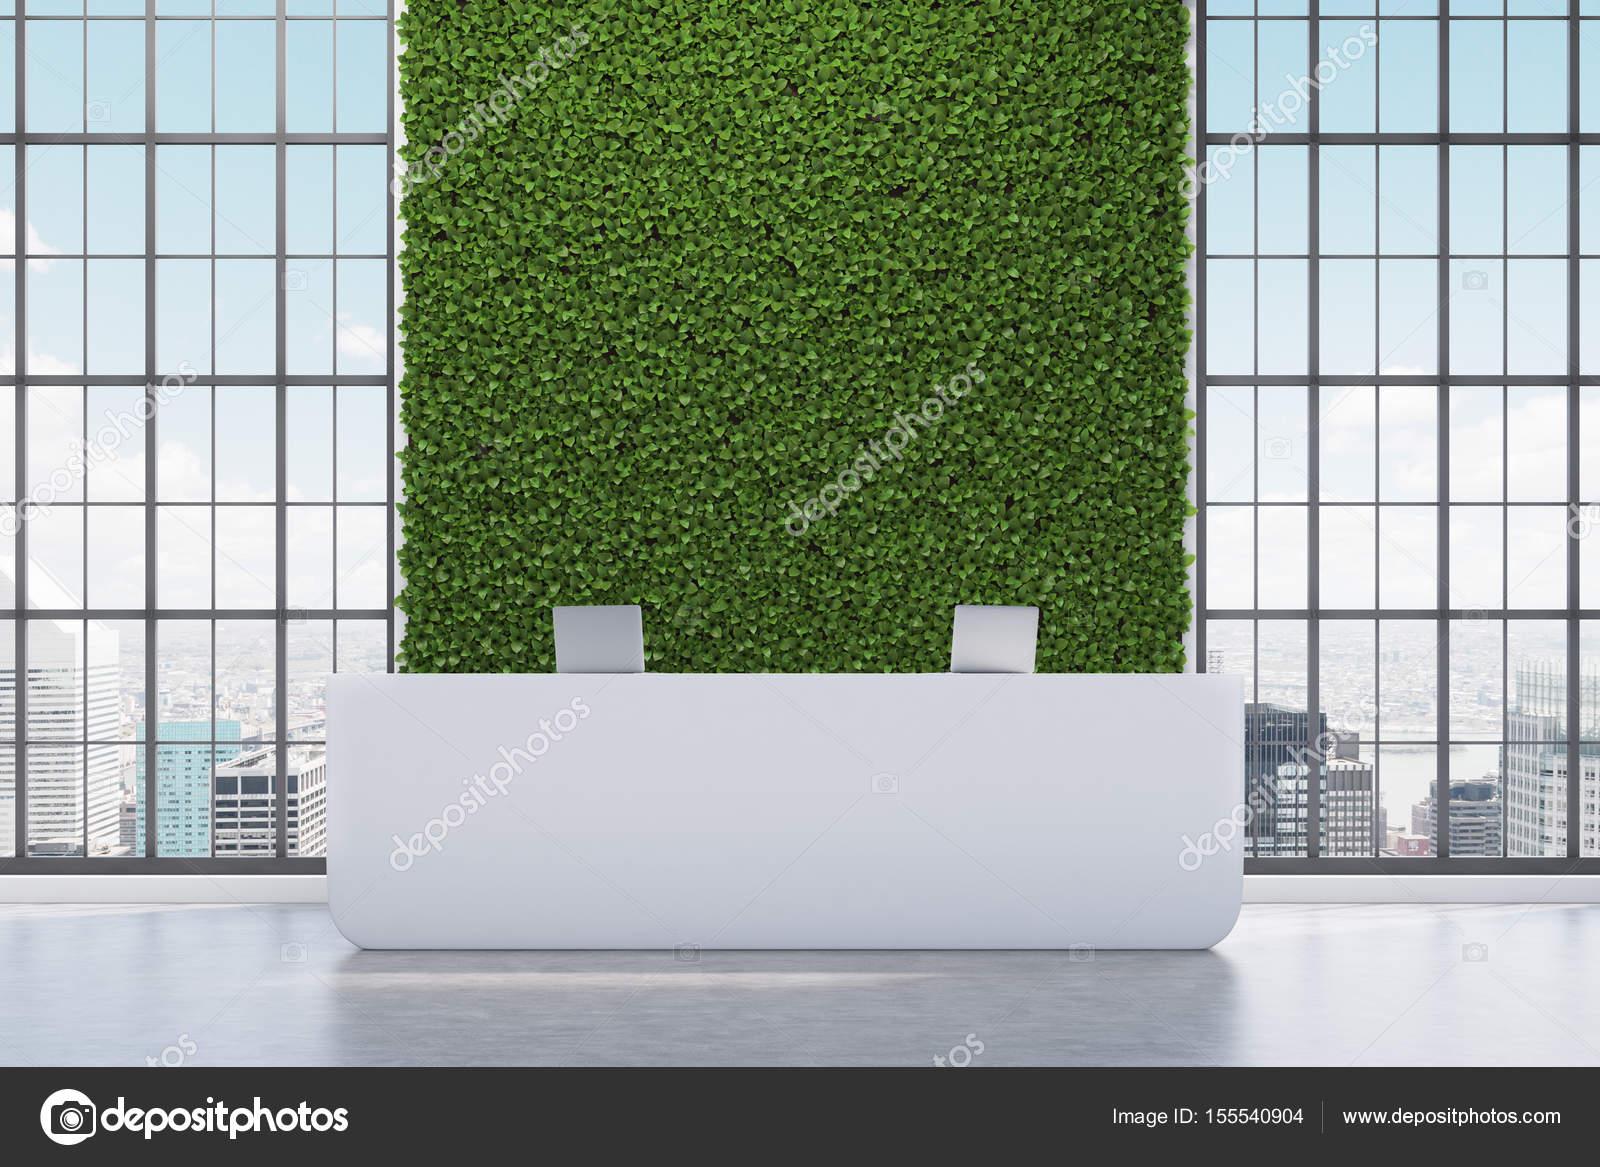 Parete Verde Ufficio : Banco reception parete verde u2014 foto stock © denisismagilov #155540904